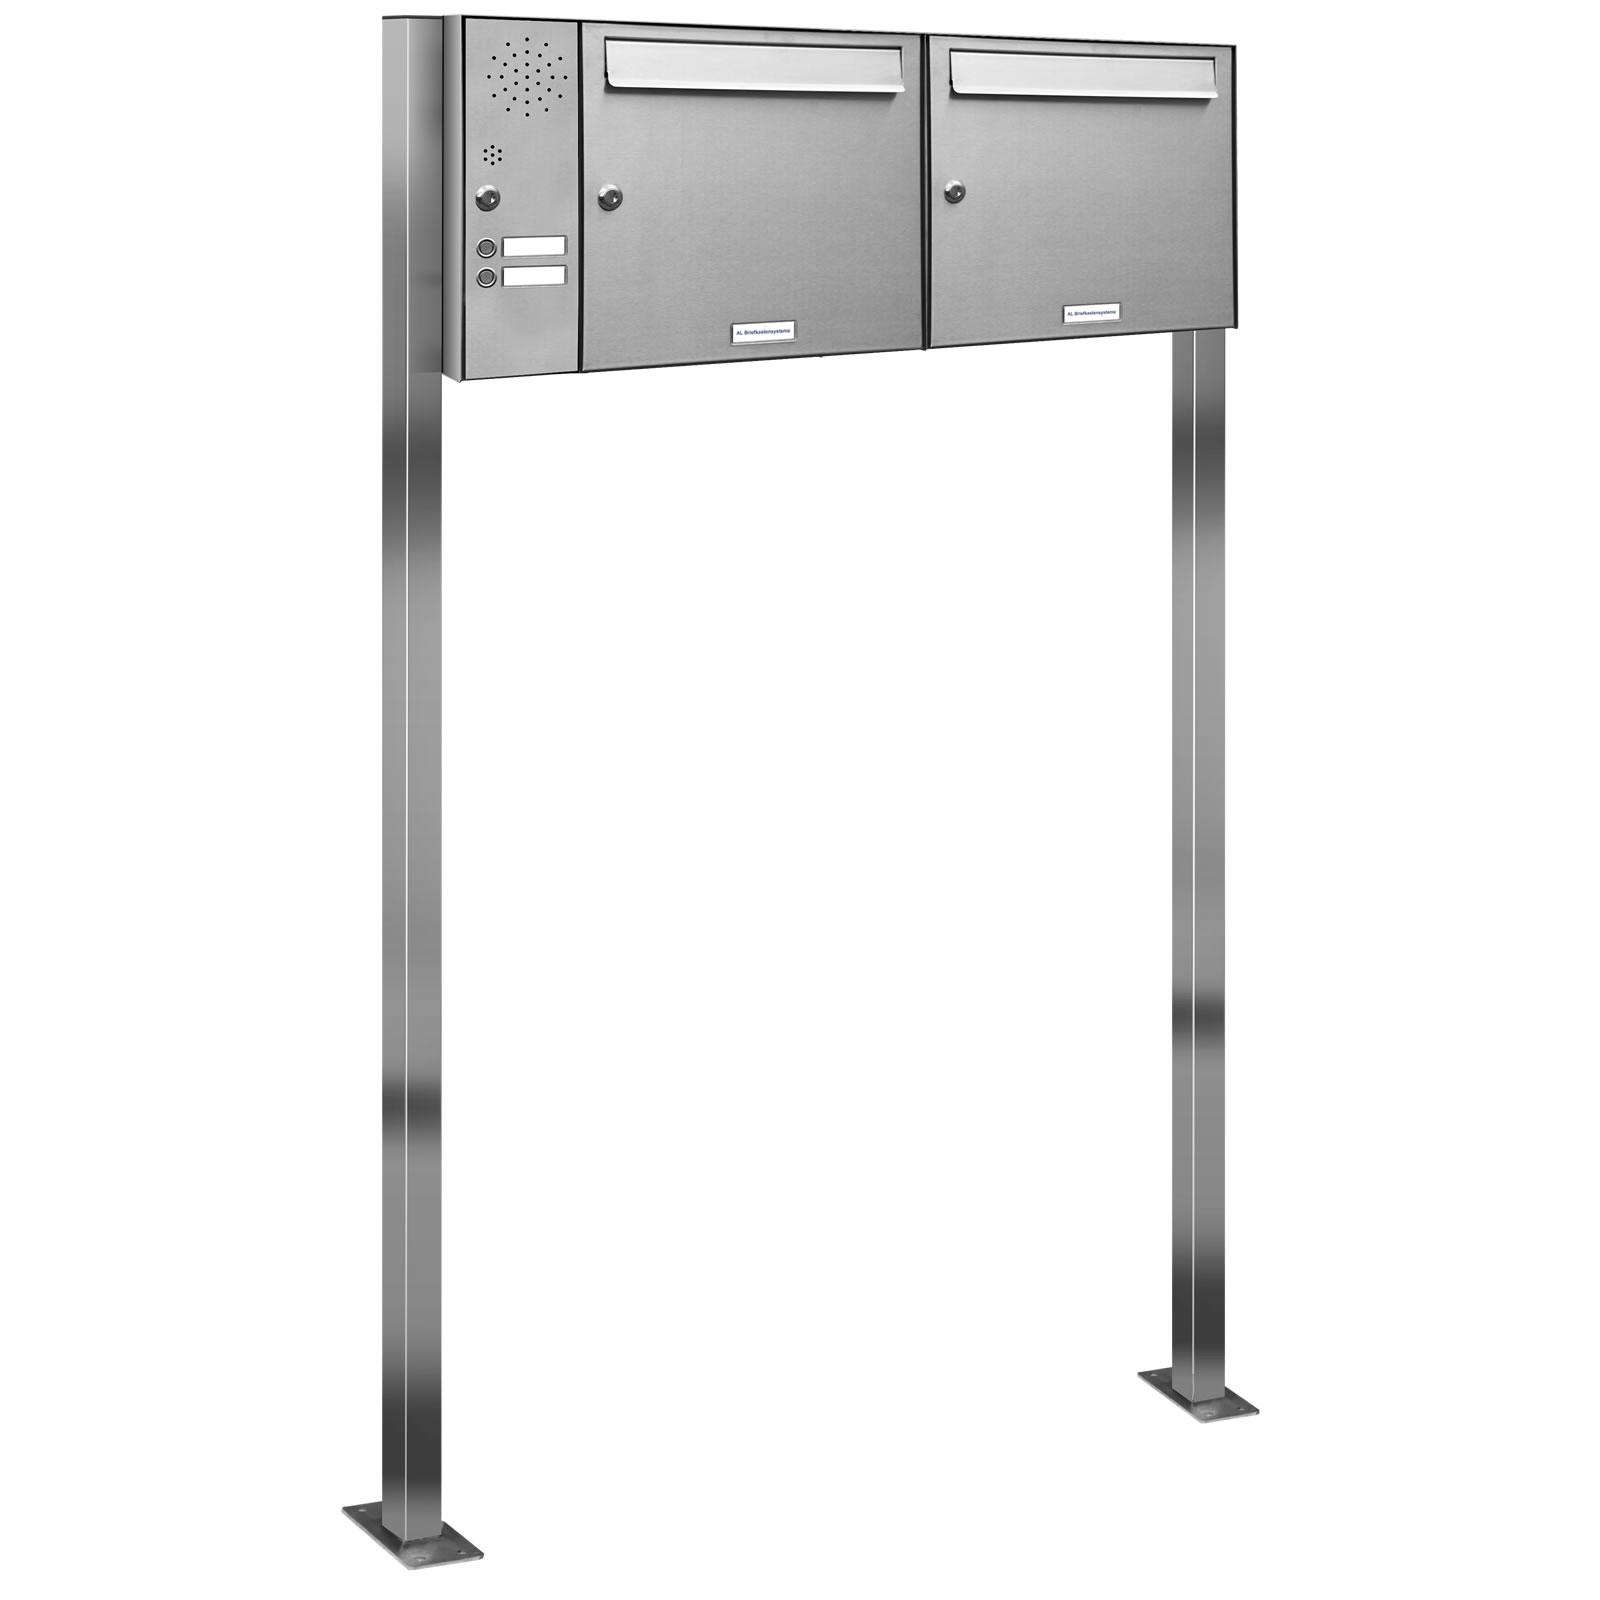 2er v2a edelstahl briefkasten standanlage freistehend mit. Black Bedroom Furniture Sets. Home Design Ideas